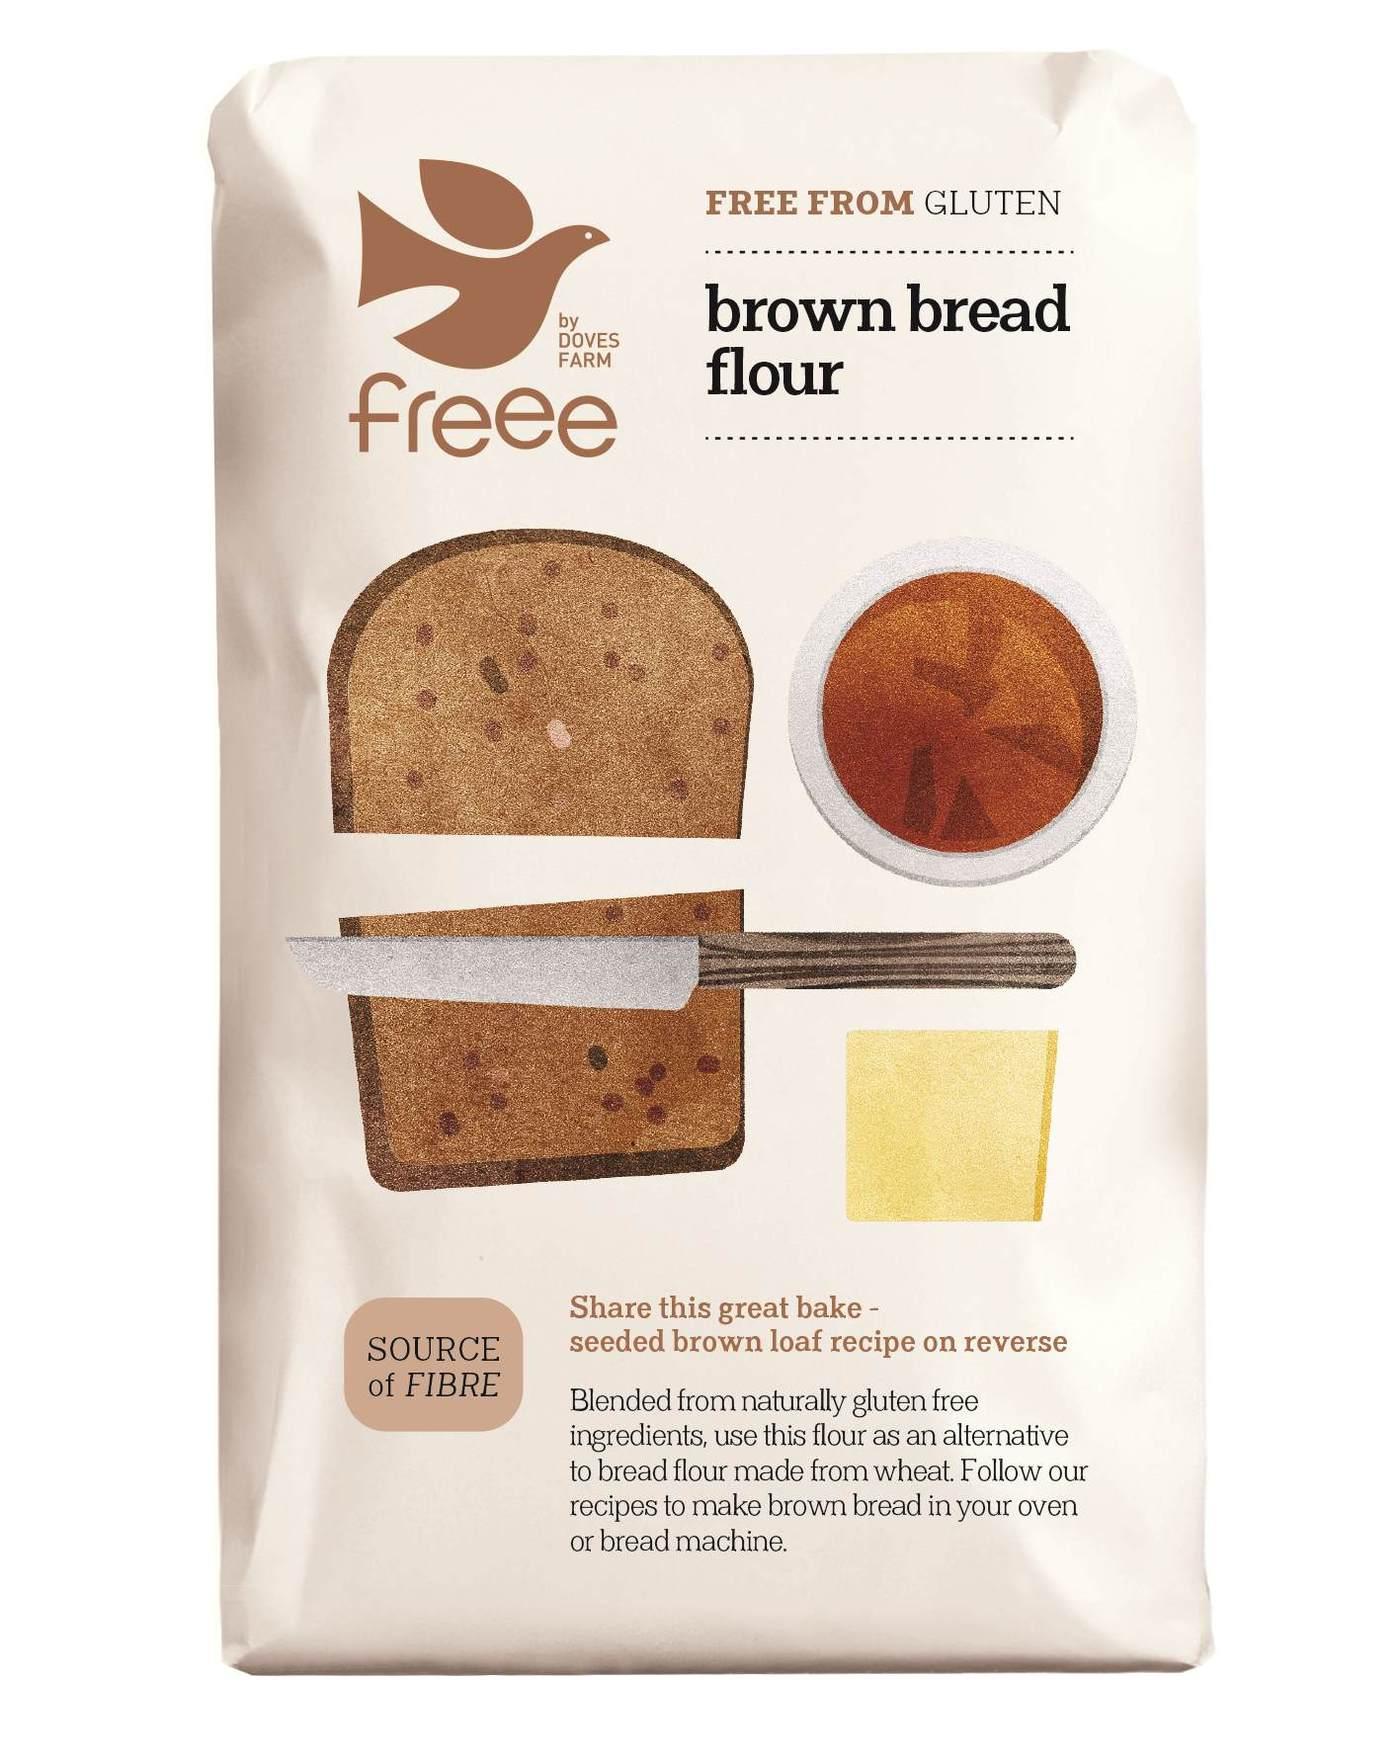 DF-Flour-GFBrownBread-HR_1400x